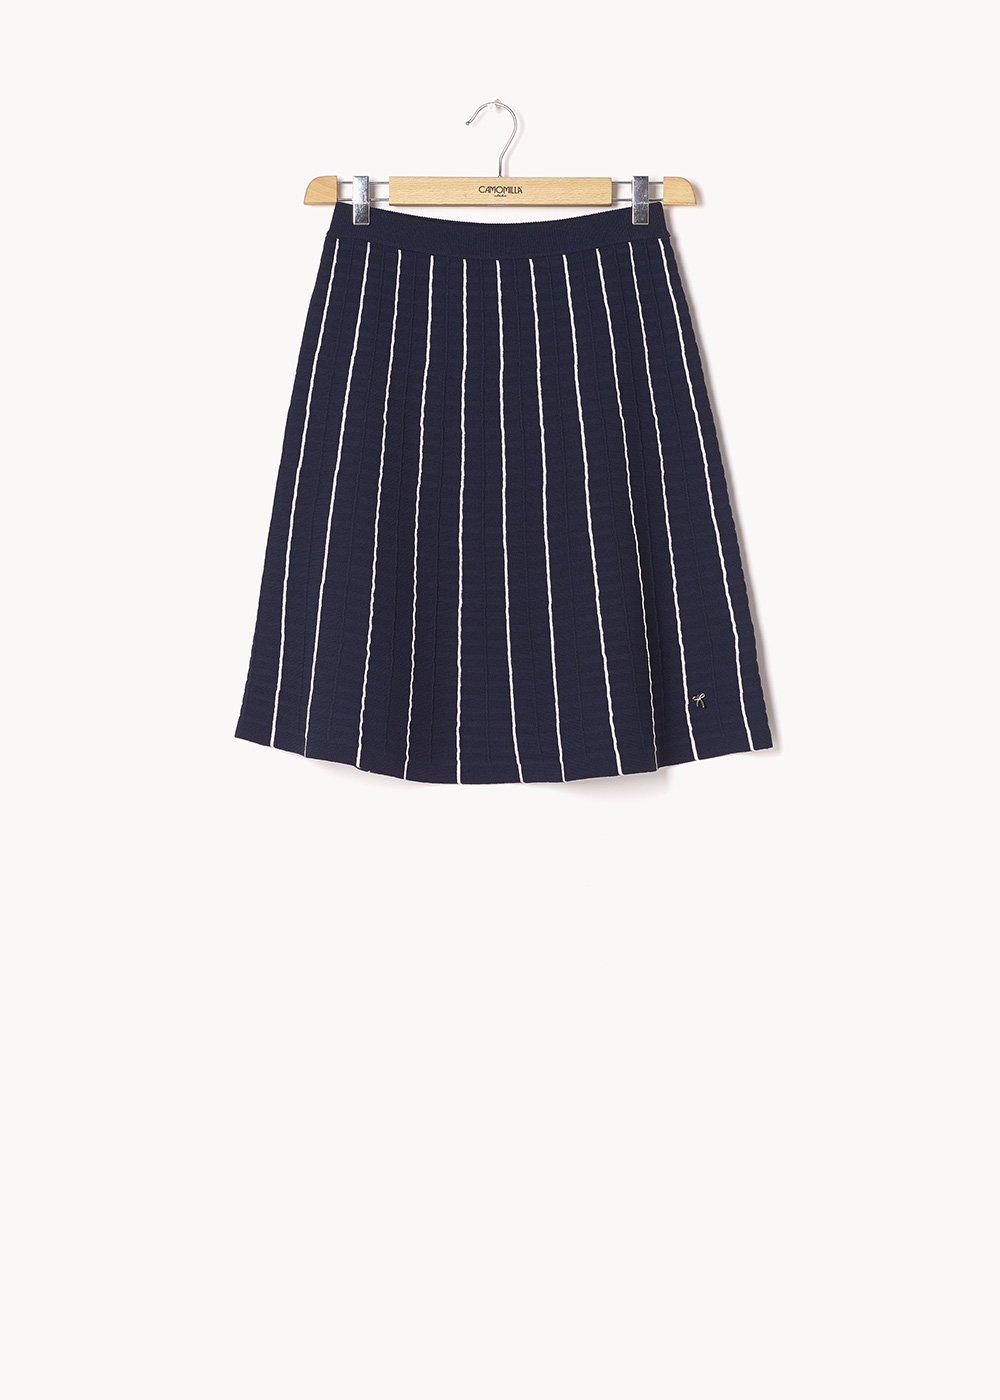 Gaylin knit skirt - Medium Blue / White - Woman